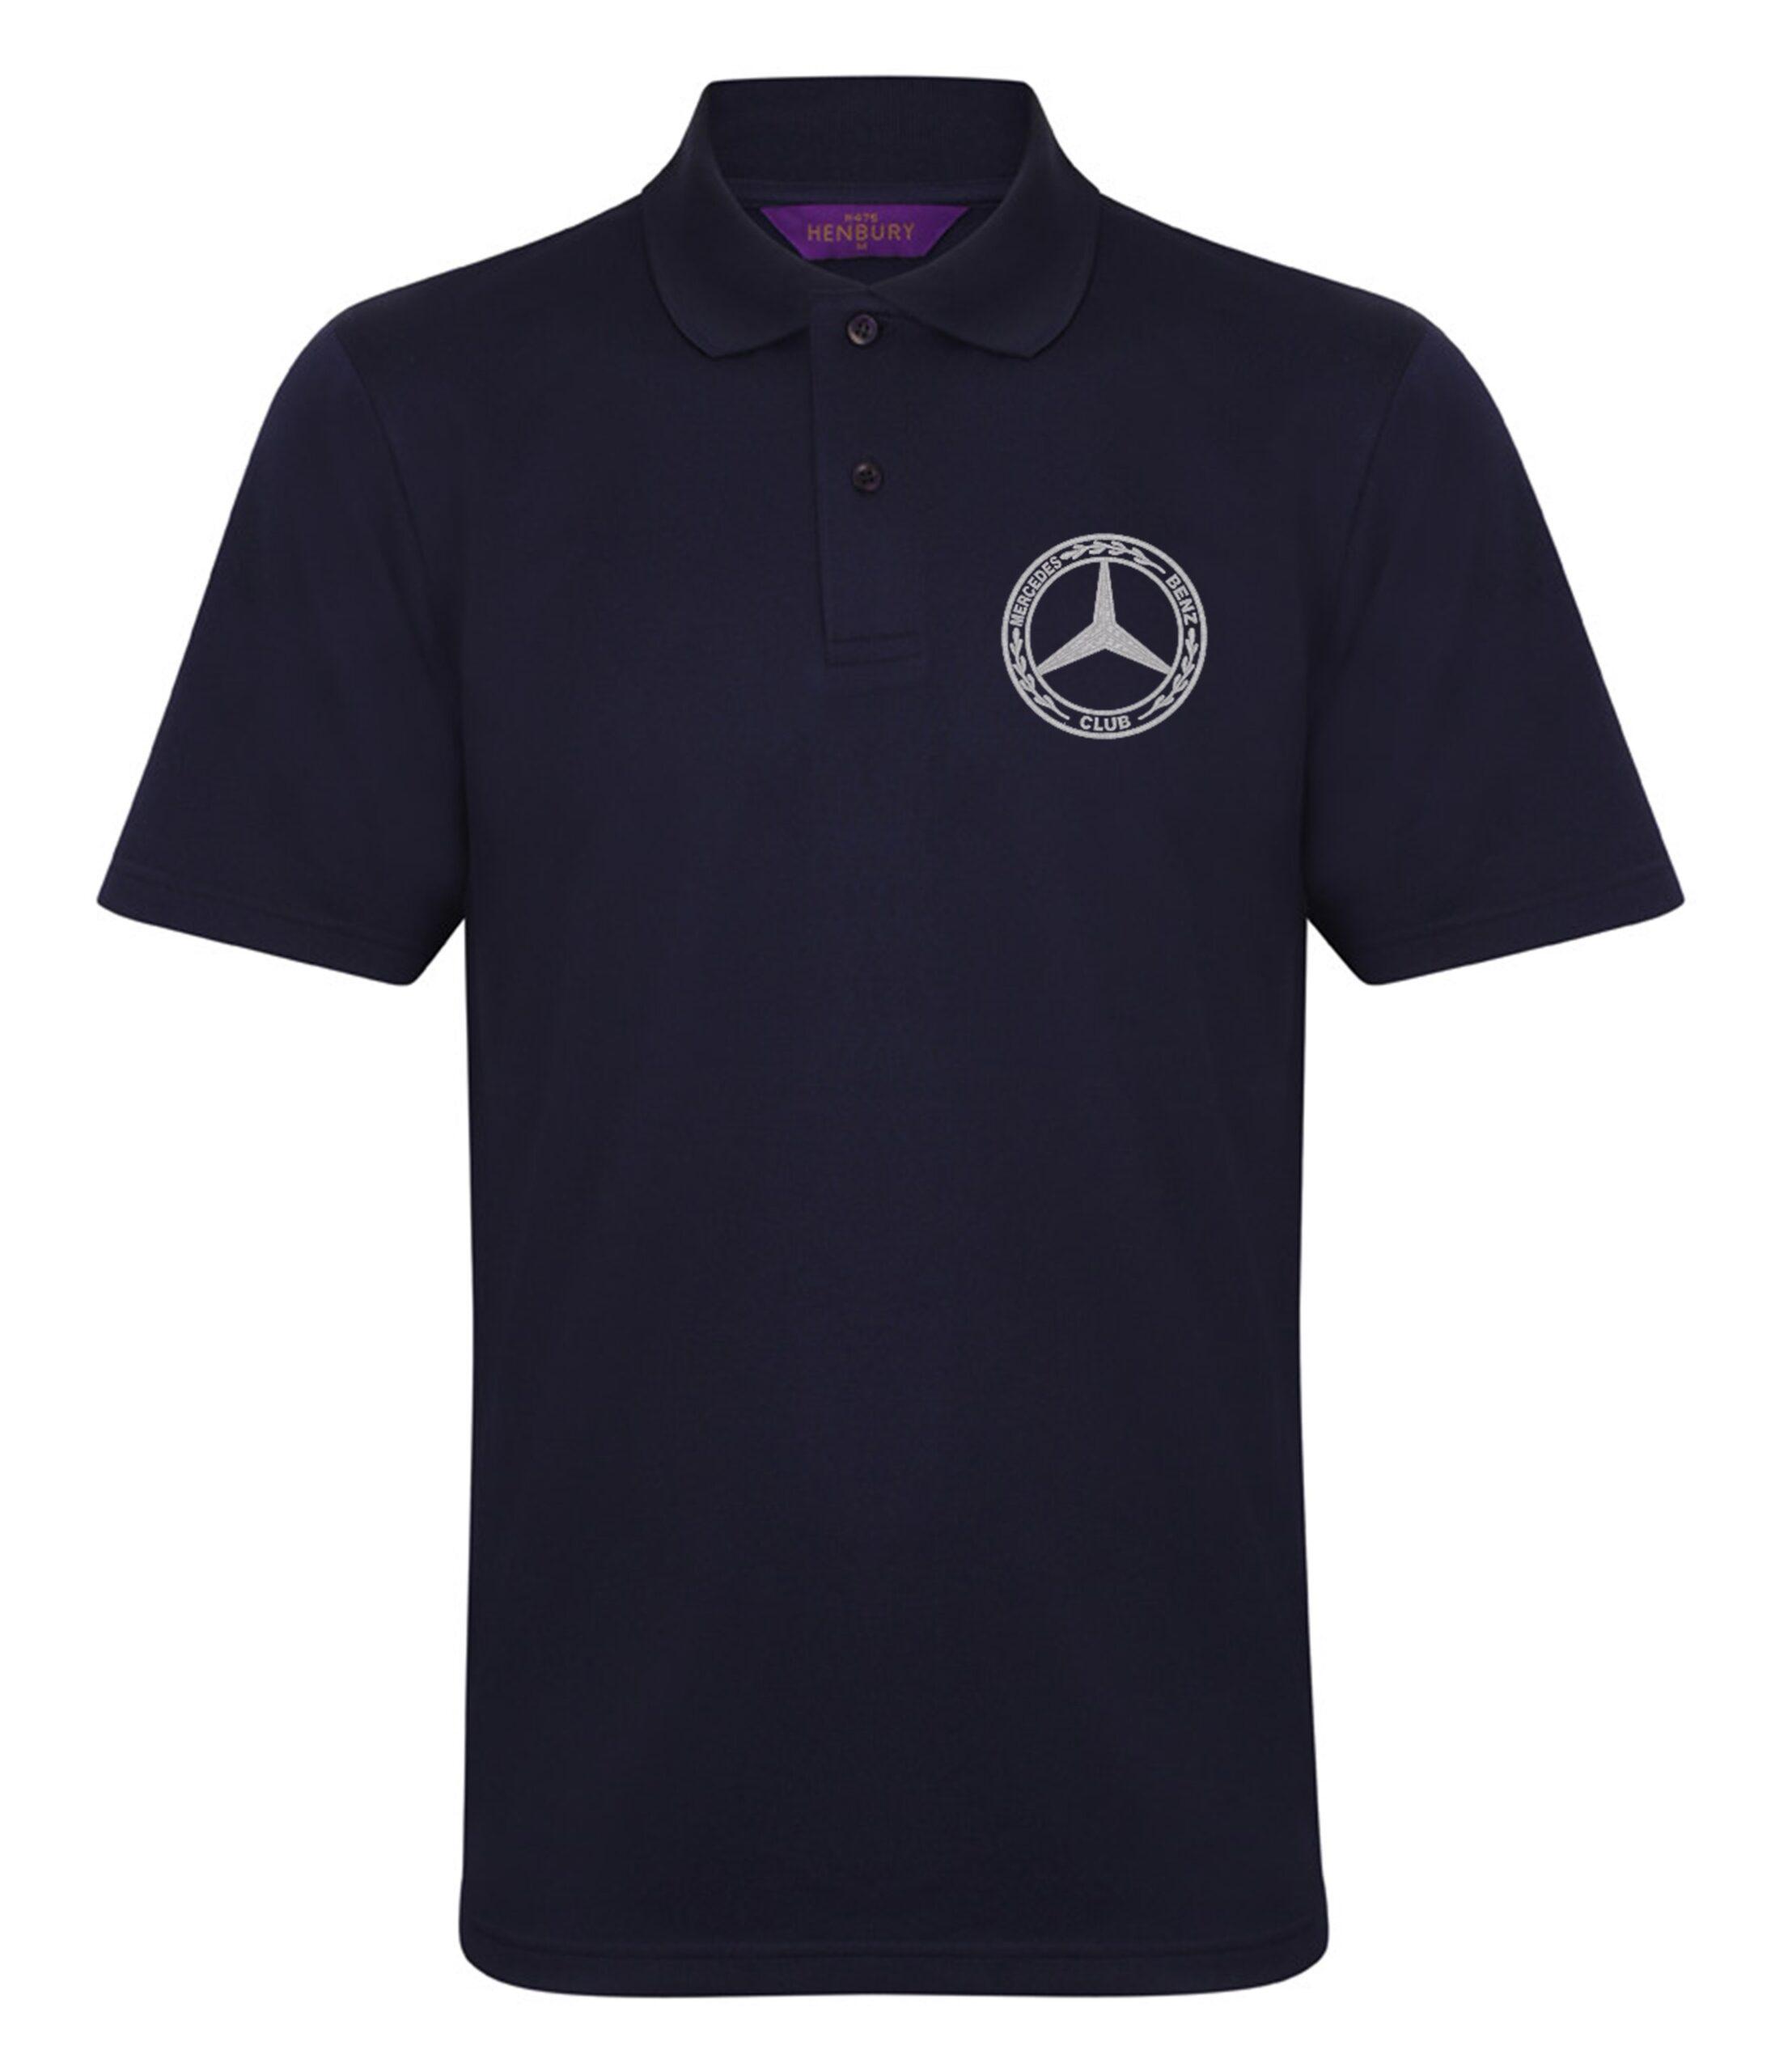 Mercedes-Benz Club Wicking Pique Polo Shirt Navy Blue